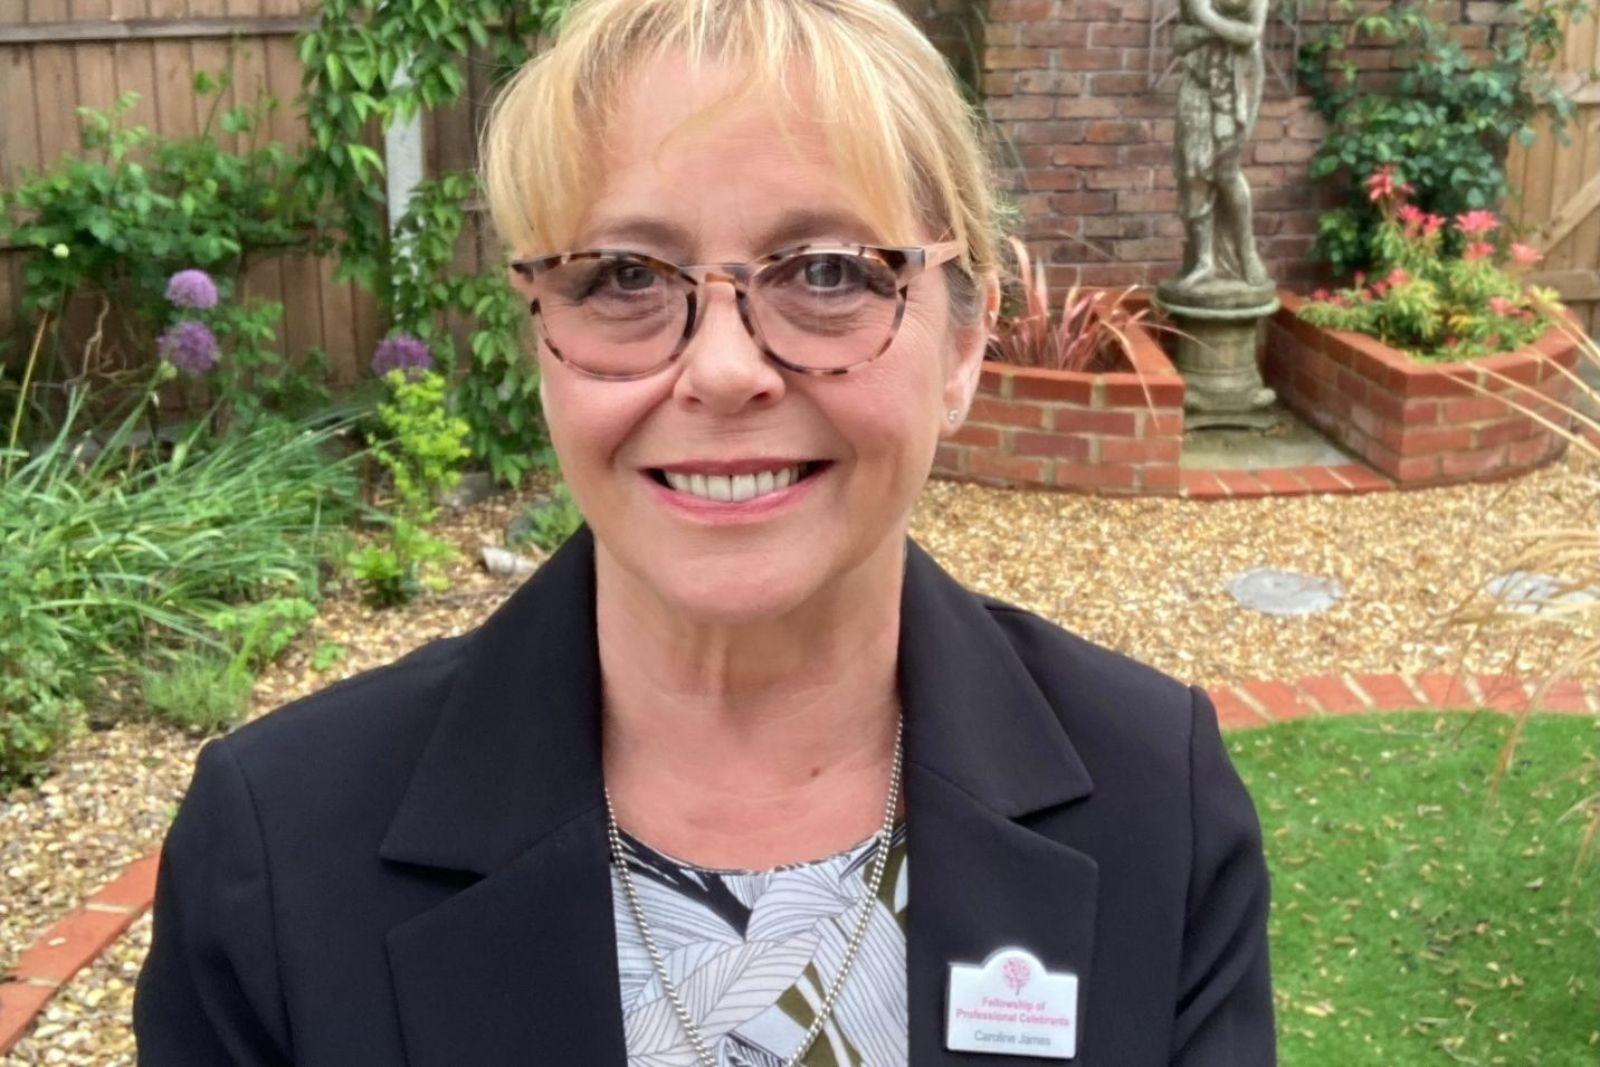 funeral celebrant Caroline James